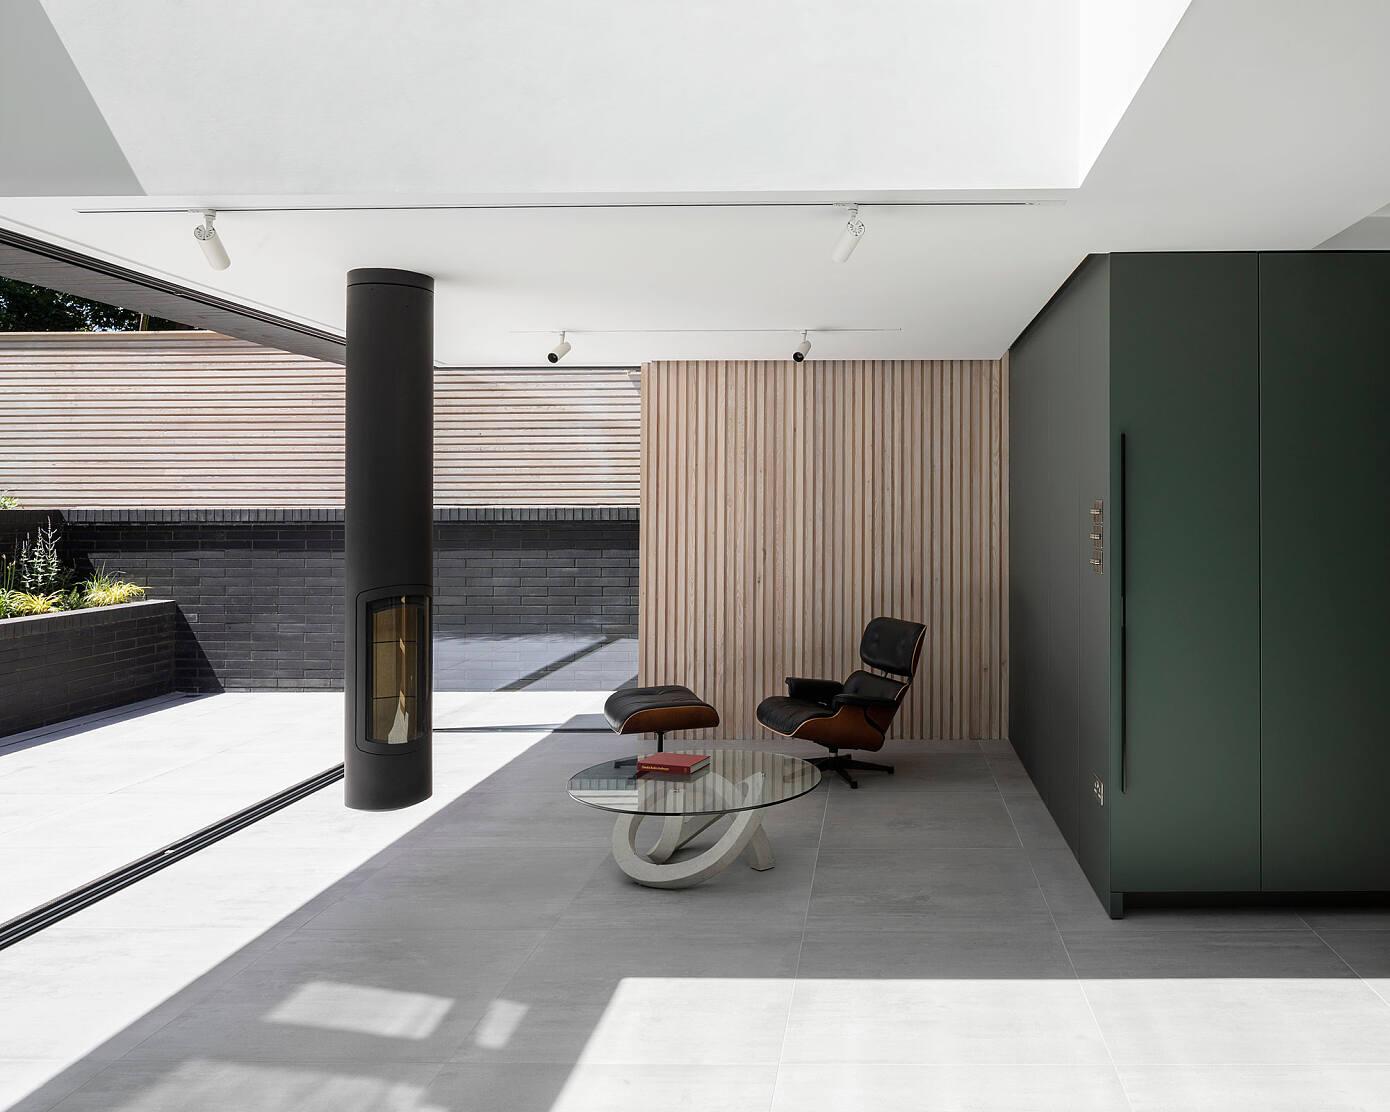 Brick Lintel House by Proctor & Shaw